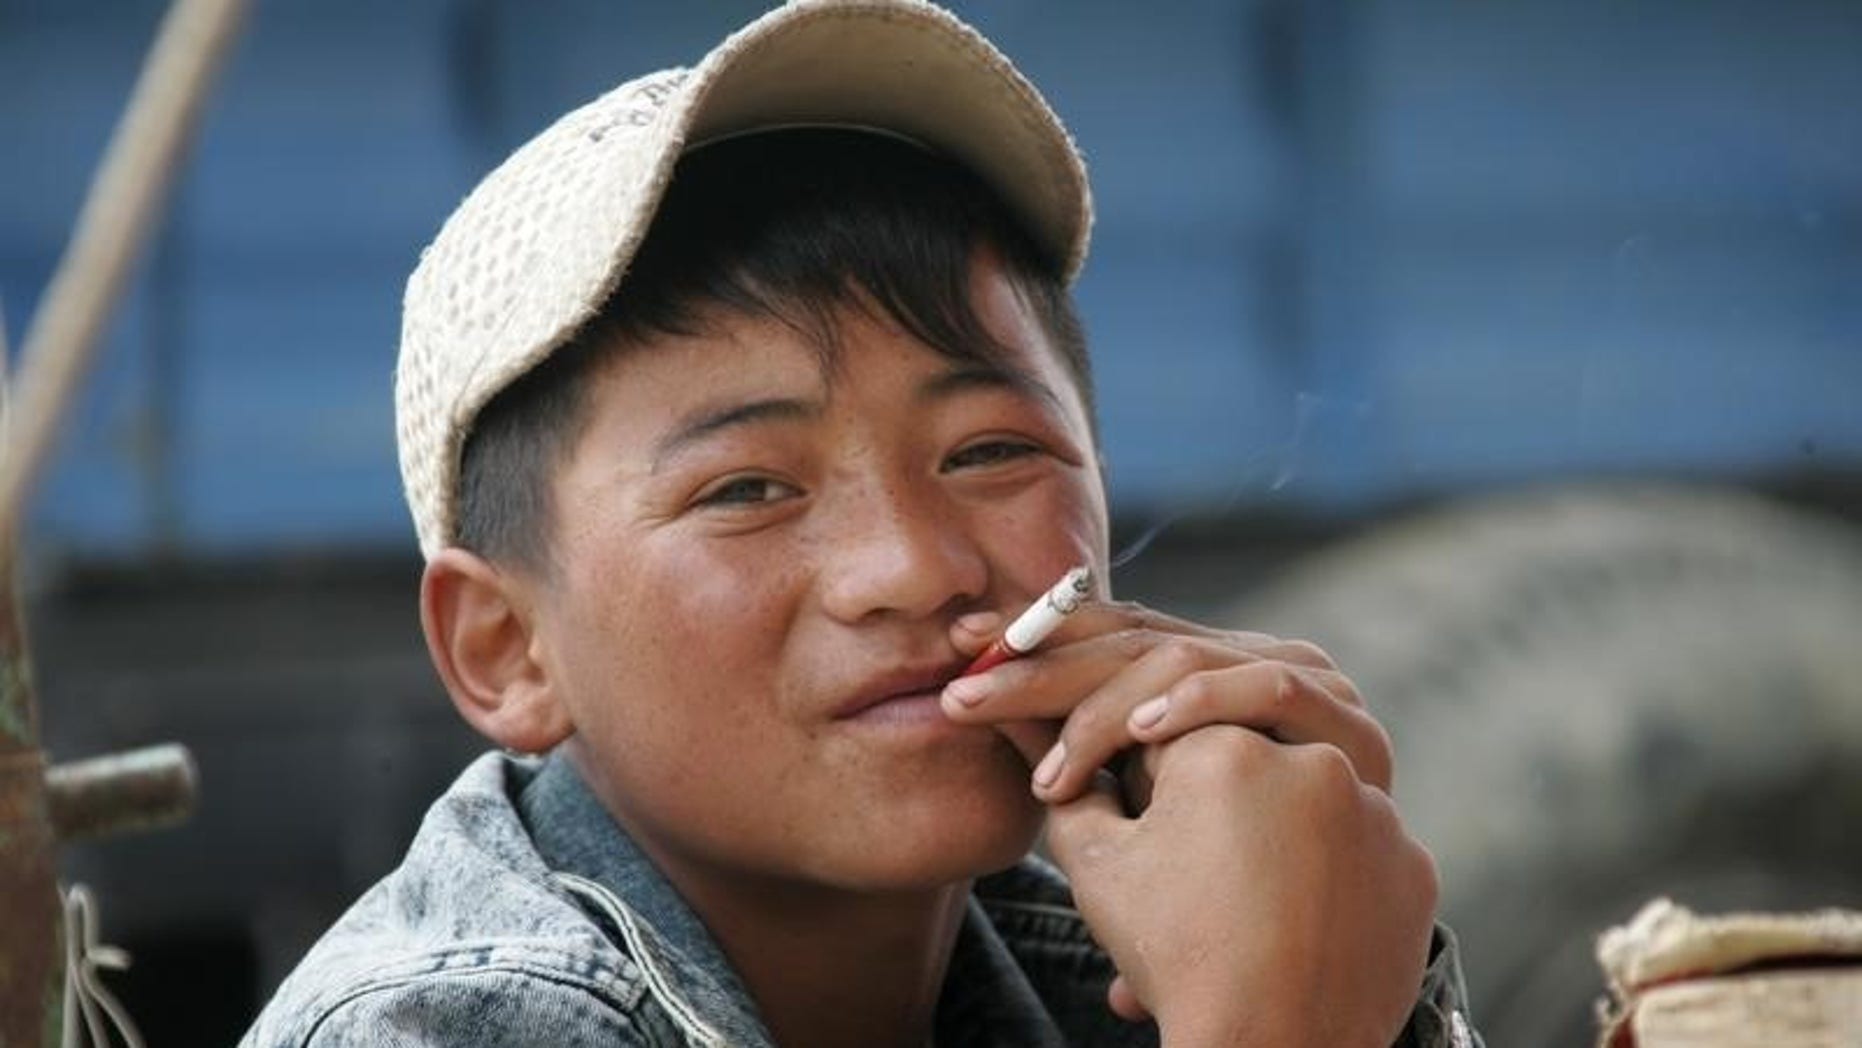 A 16-year-old Tibetan boy smokes in Dangxiong country, Tibet, June 29, 2006.   REUTERS/Jason Lee